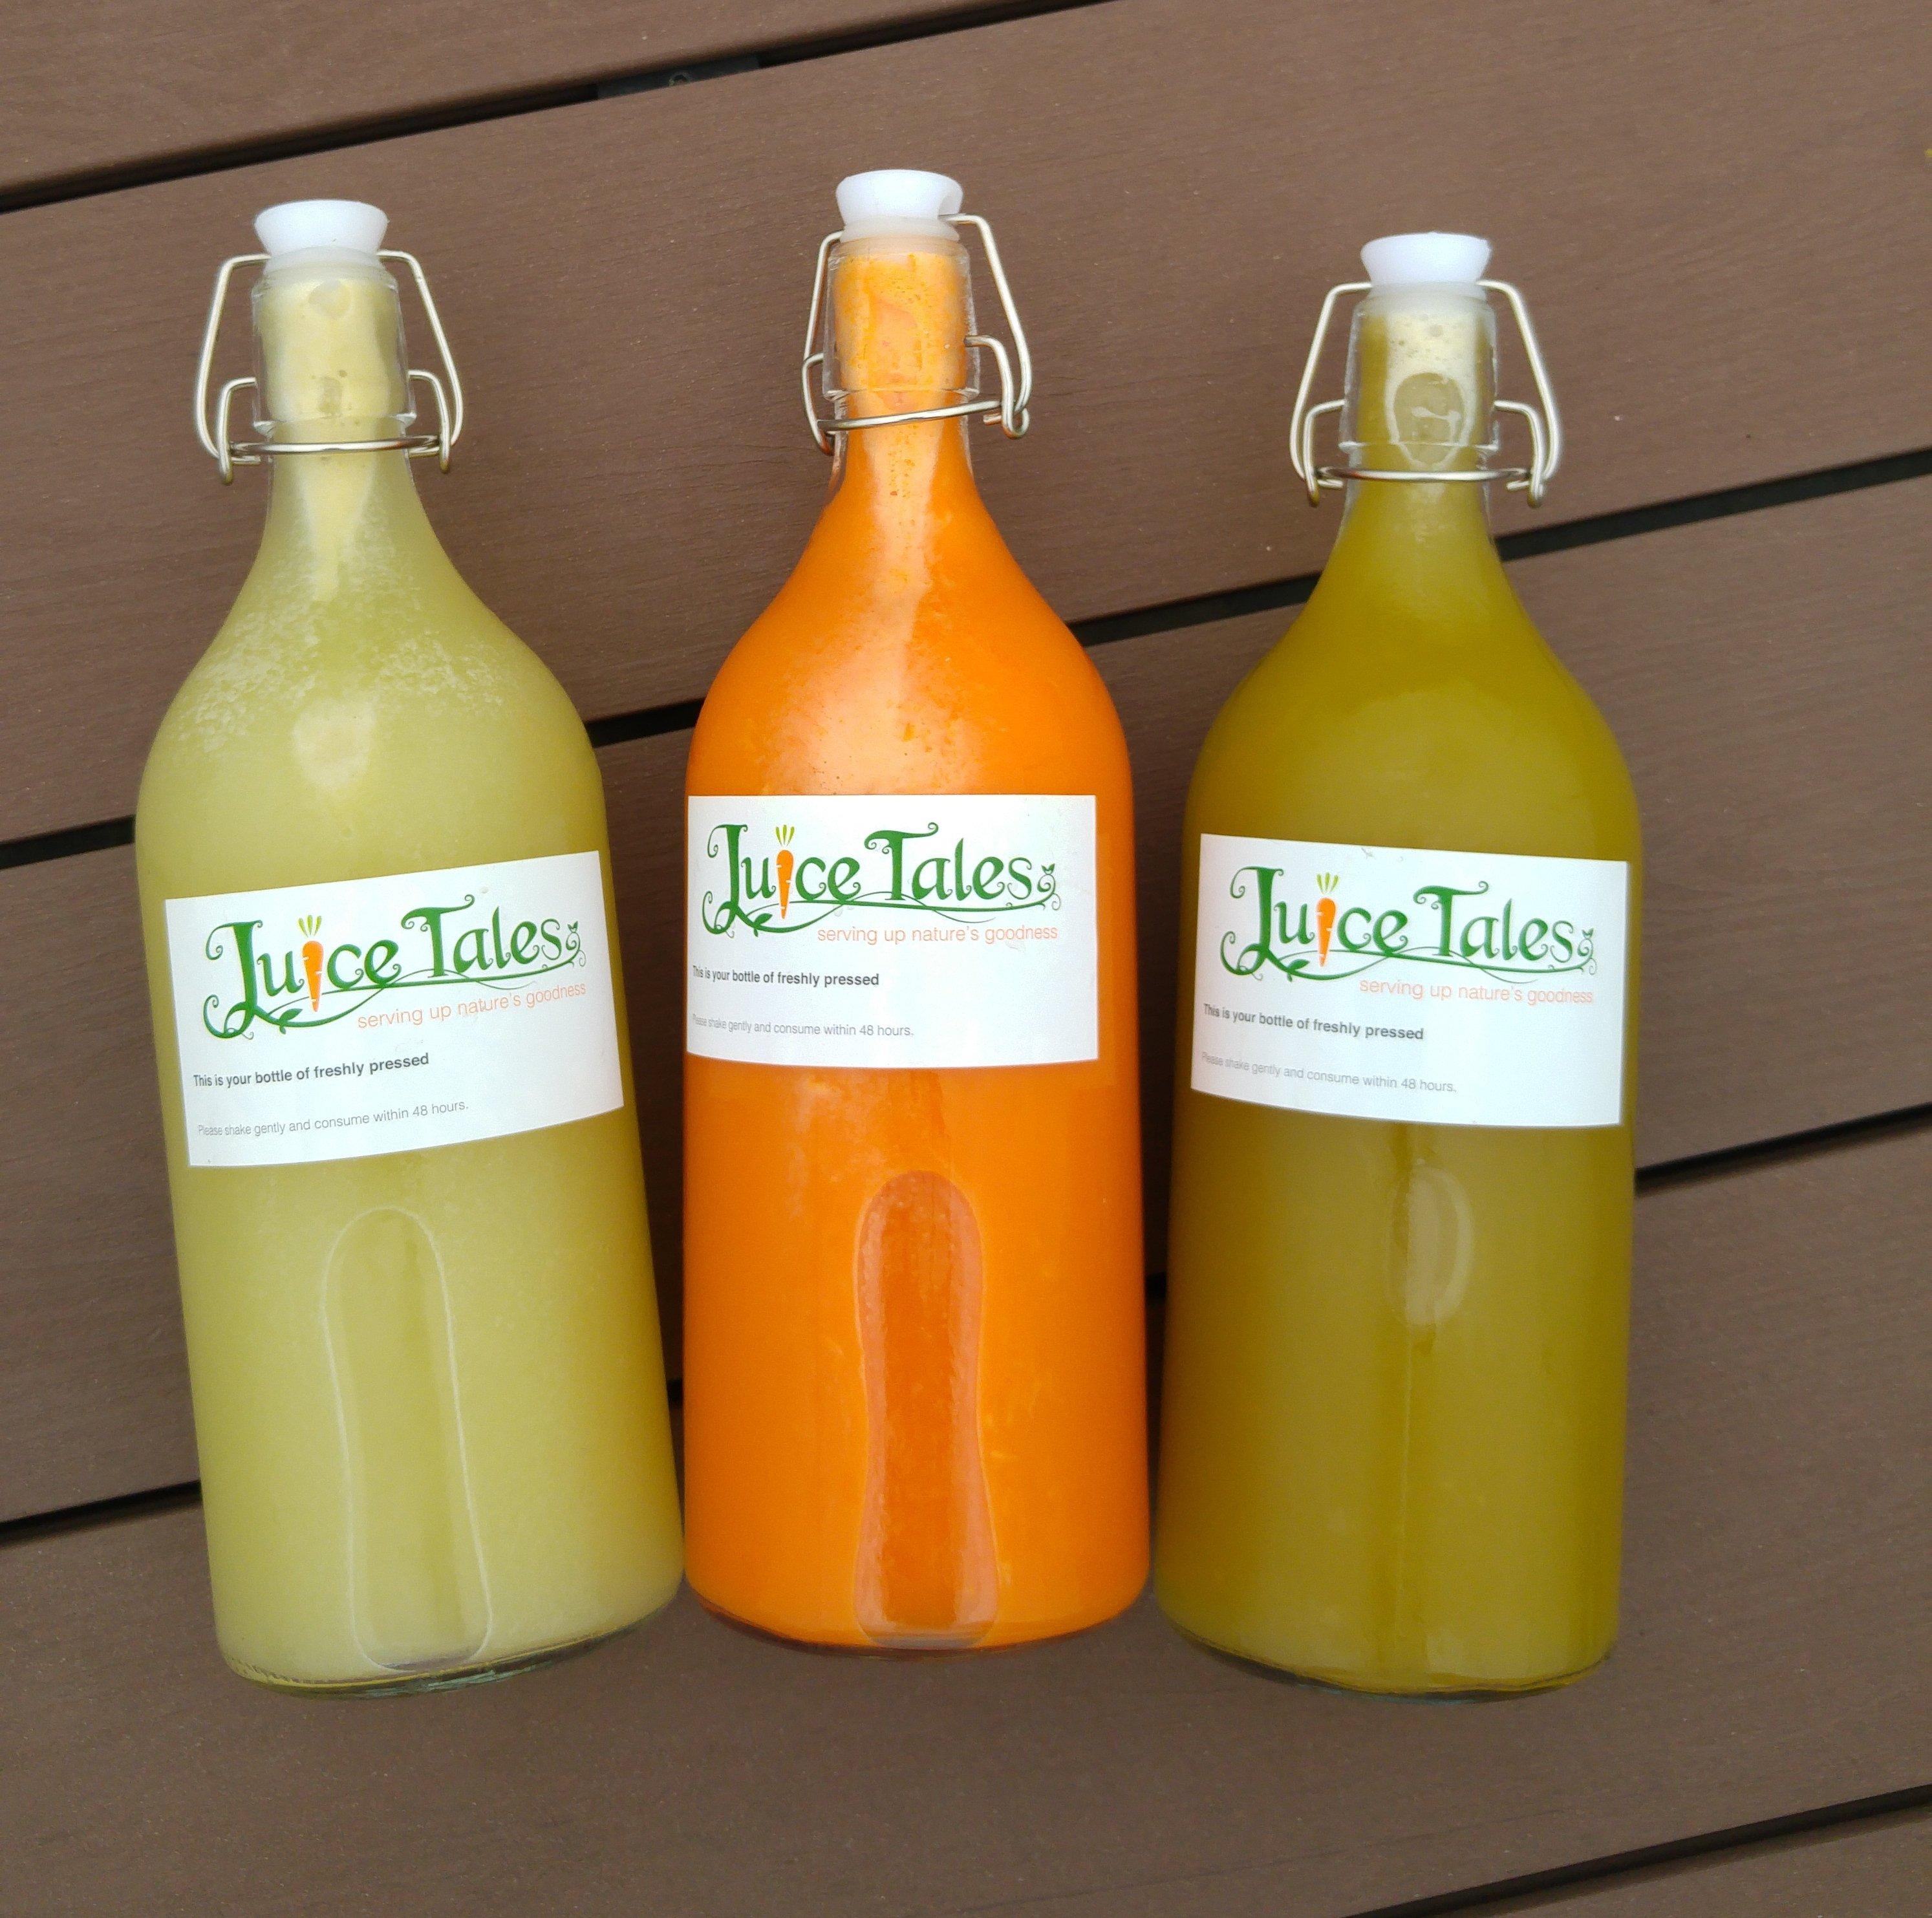 Create Your Own Signature Juice Bottle